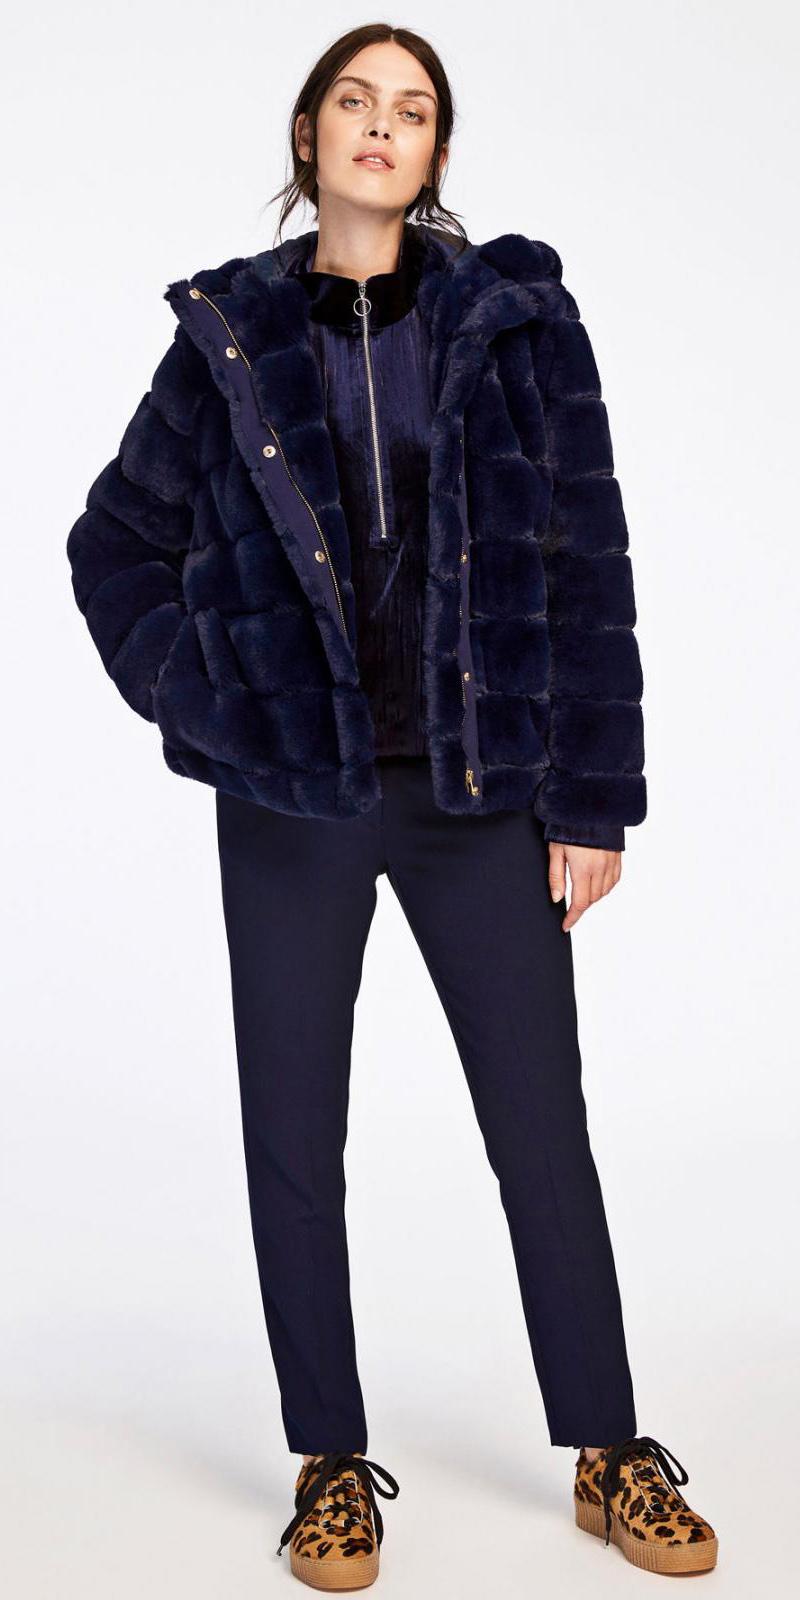 blue-navy-slim-pants-pony-velvet-tan-shoe-sneakers-leopard-print-blue-navy-jacket-coat-puffer-fall-winter-hairr-lunch.jpg